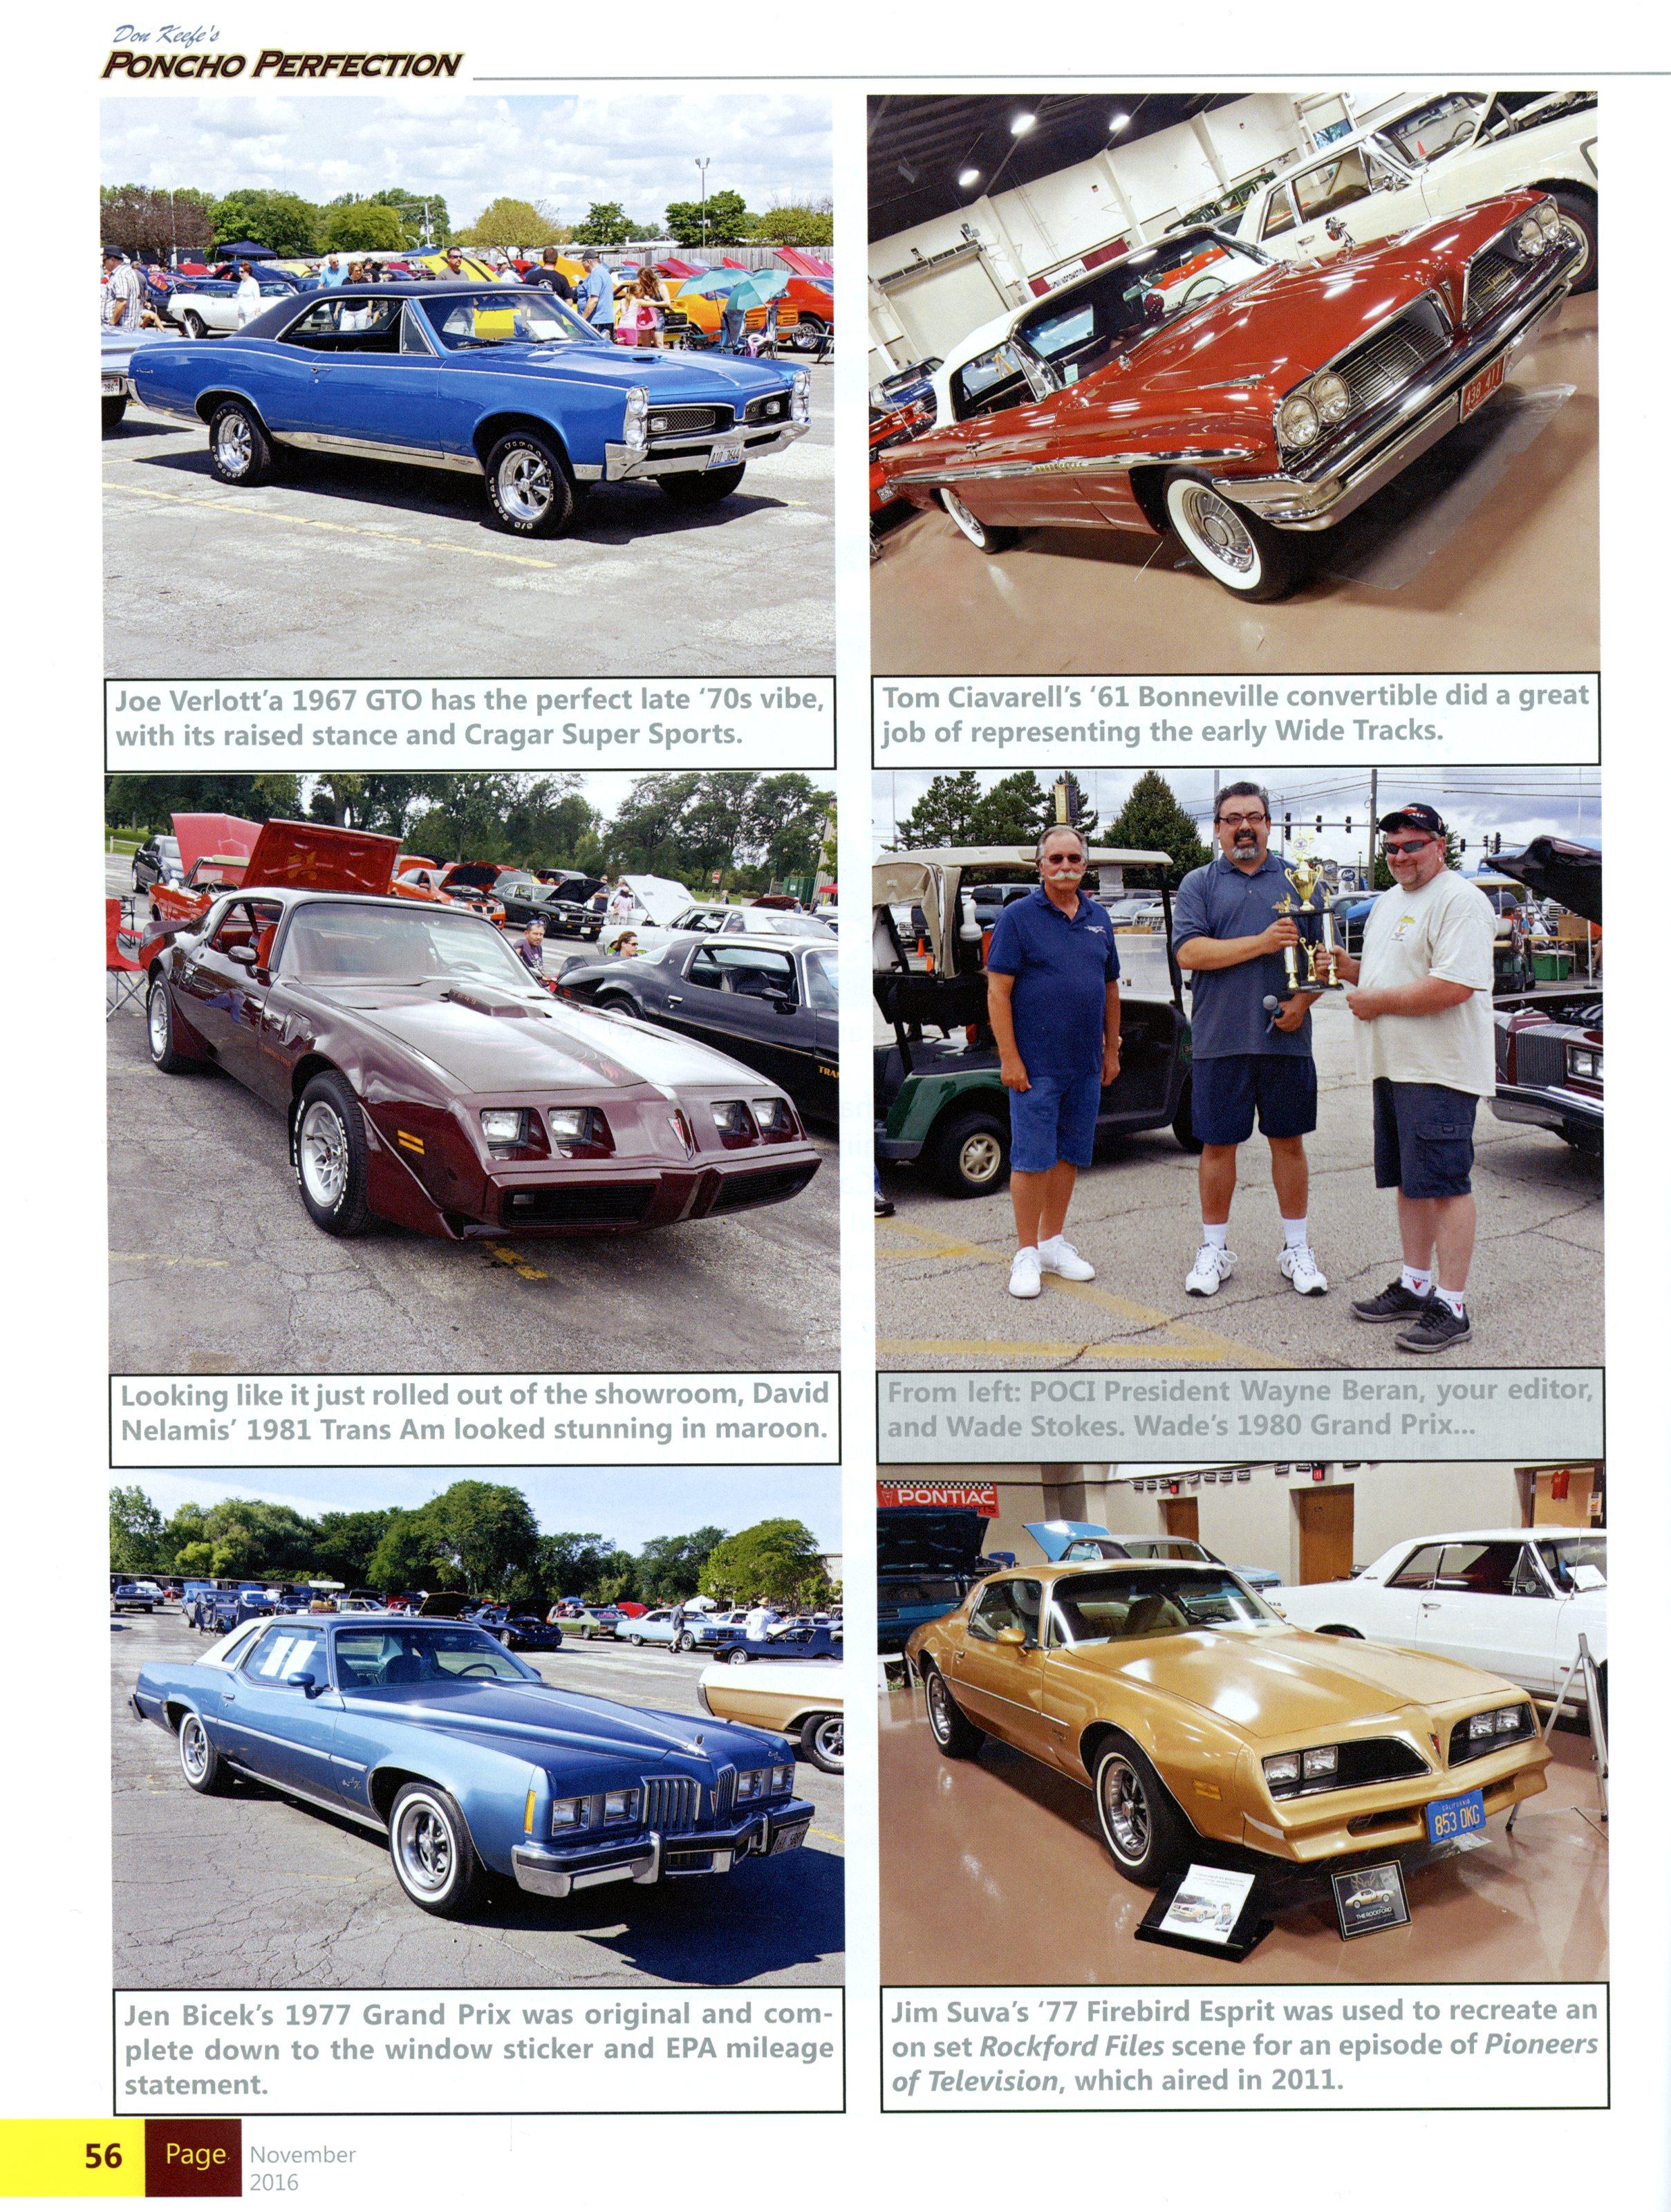 Rockford Firebird in Poncho Perfection Magazine - Jim Suva and The ...